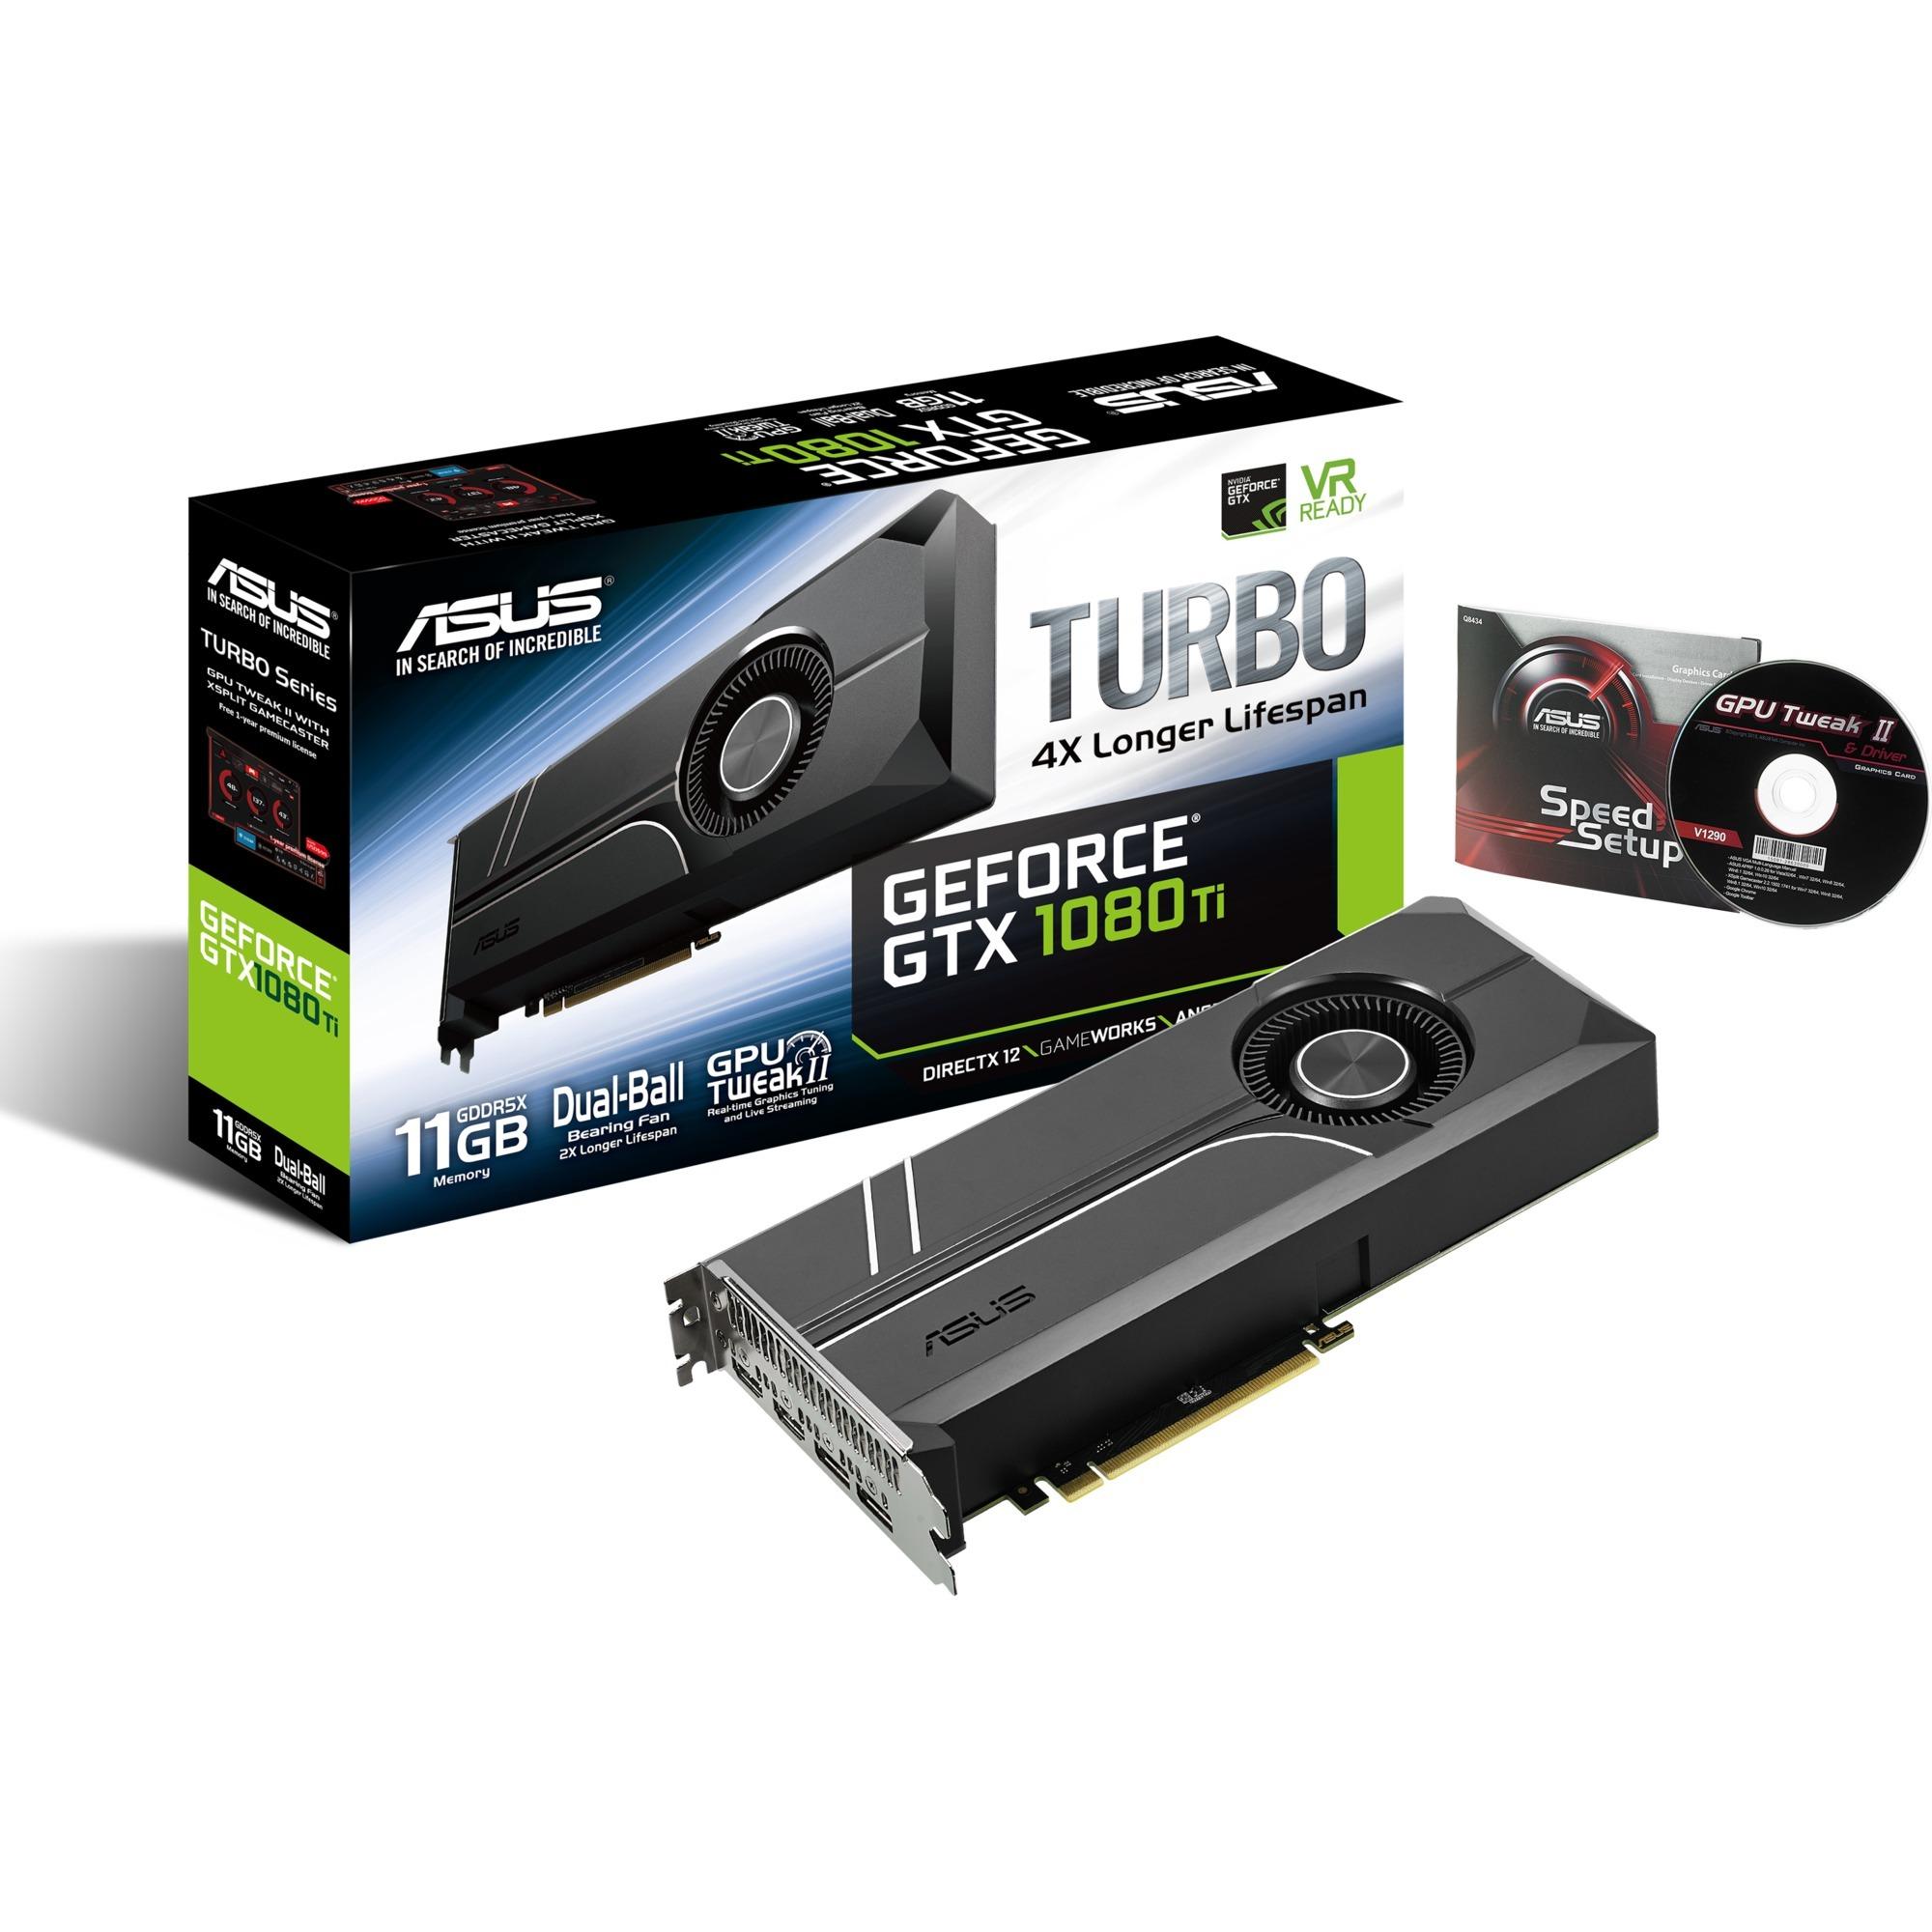 GeForce GTX 1080 Ti TURBO, Tarjeta gráfica